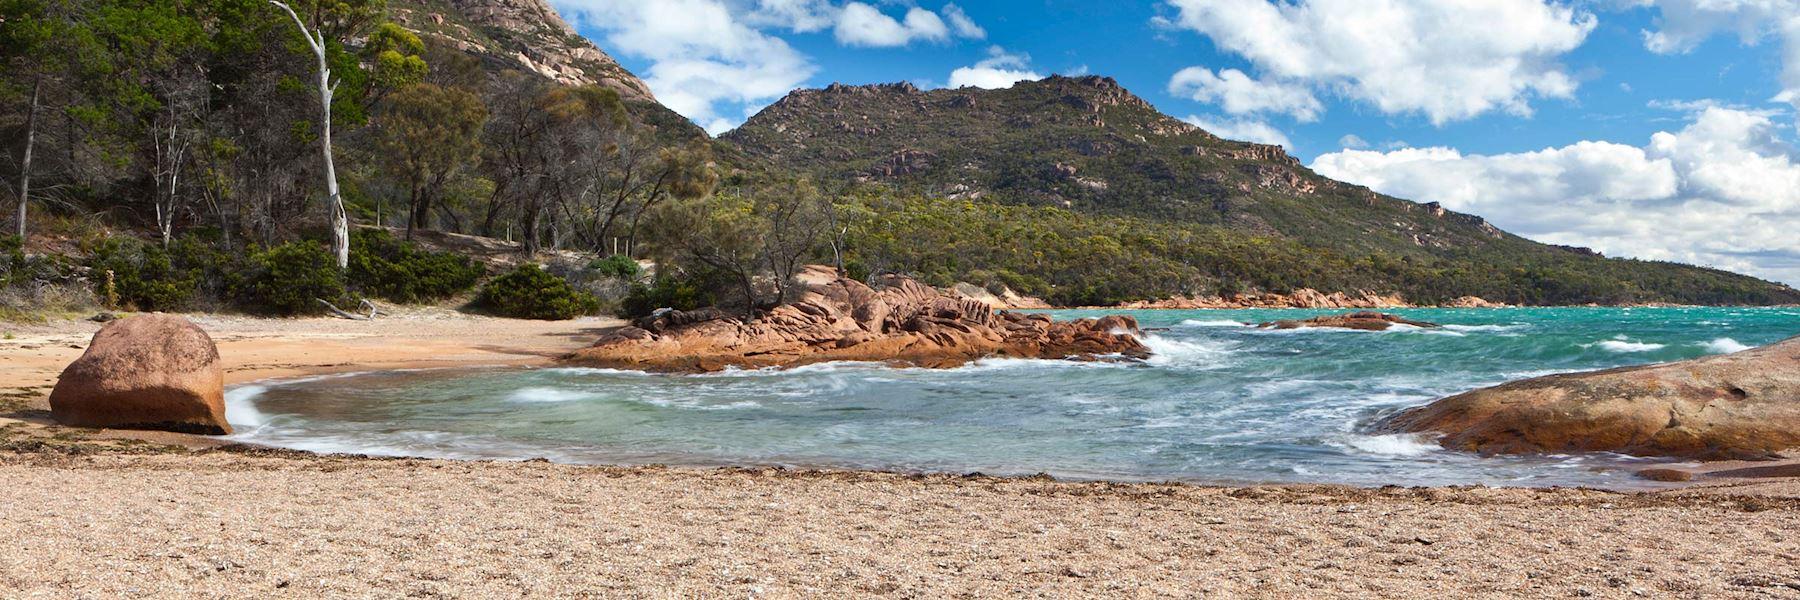 Visit Freycinet National Park, Australia